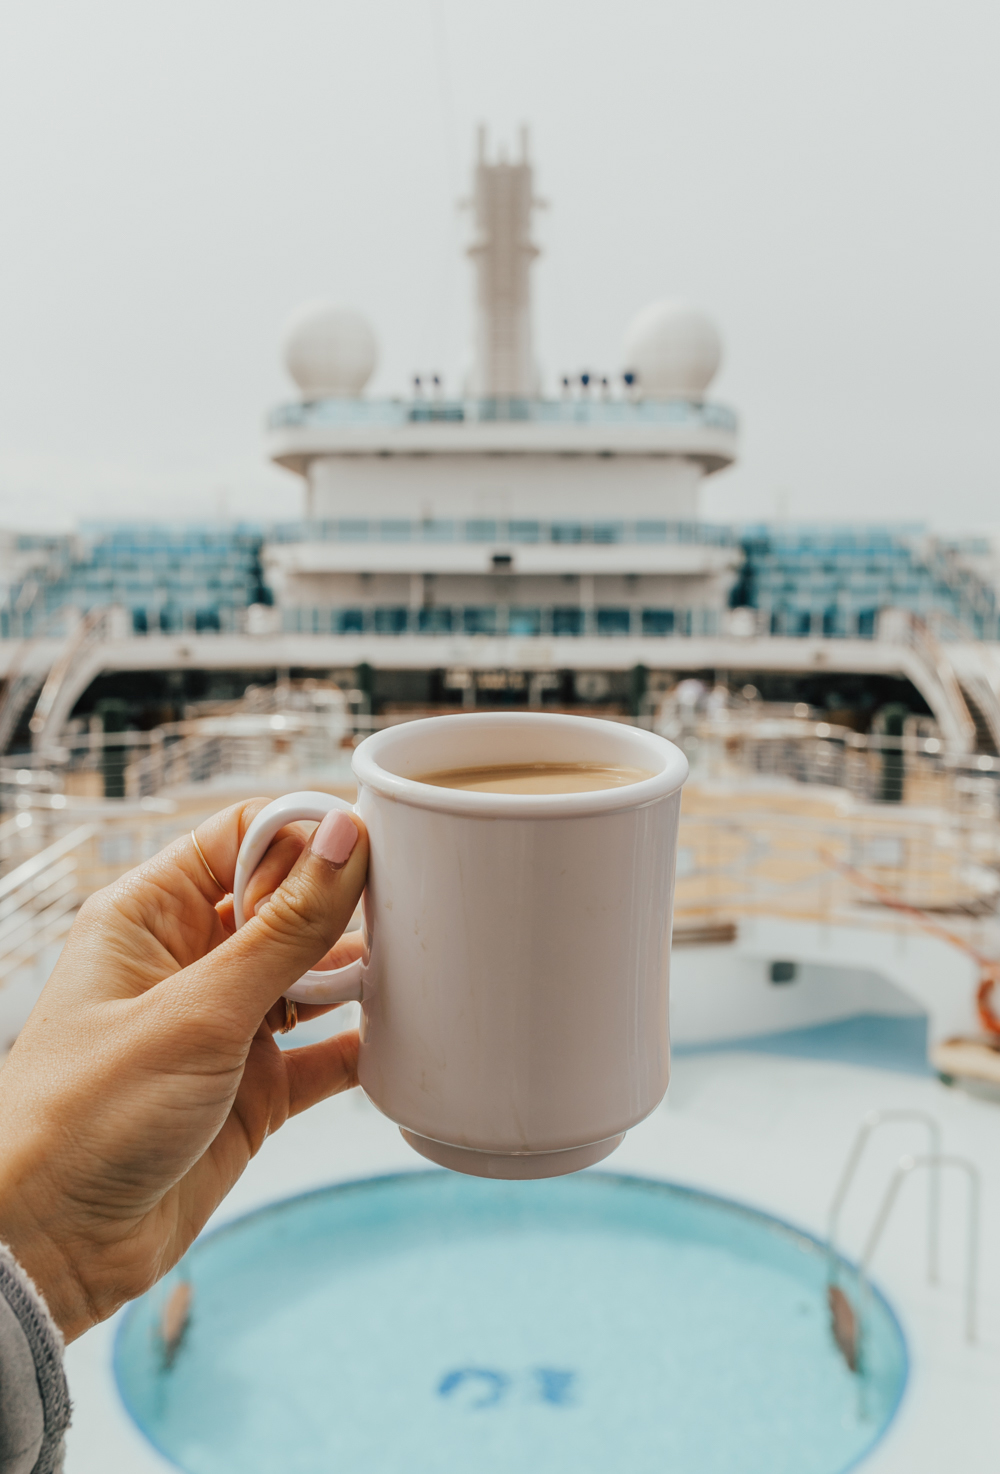 livvyland-blog-olivia-watson-travel-fashion-blogger-princess-cruises-regal-ship-what-to-do-on-board-cruise-boat-coffee-balcony